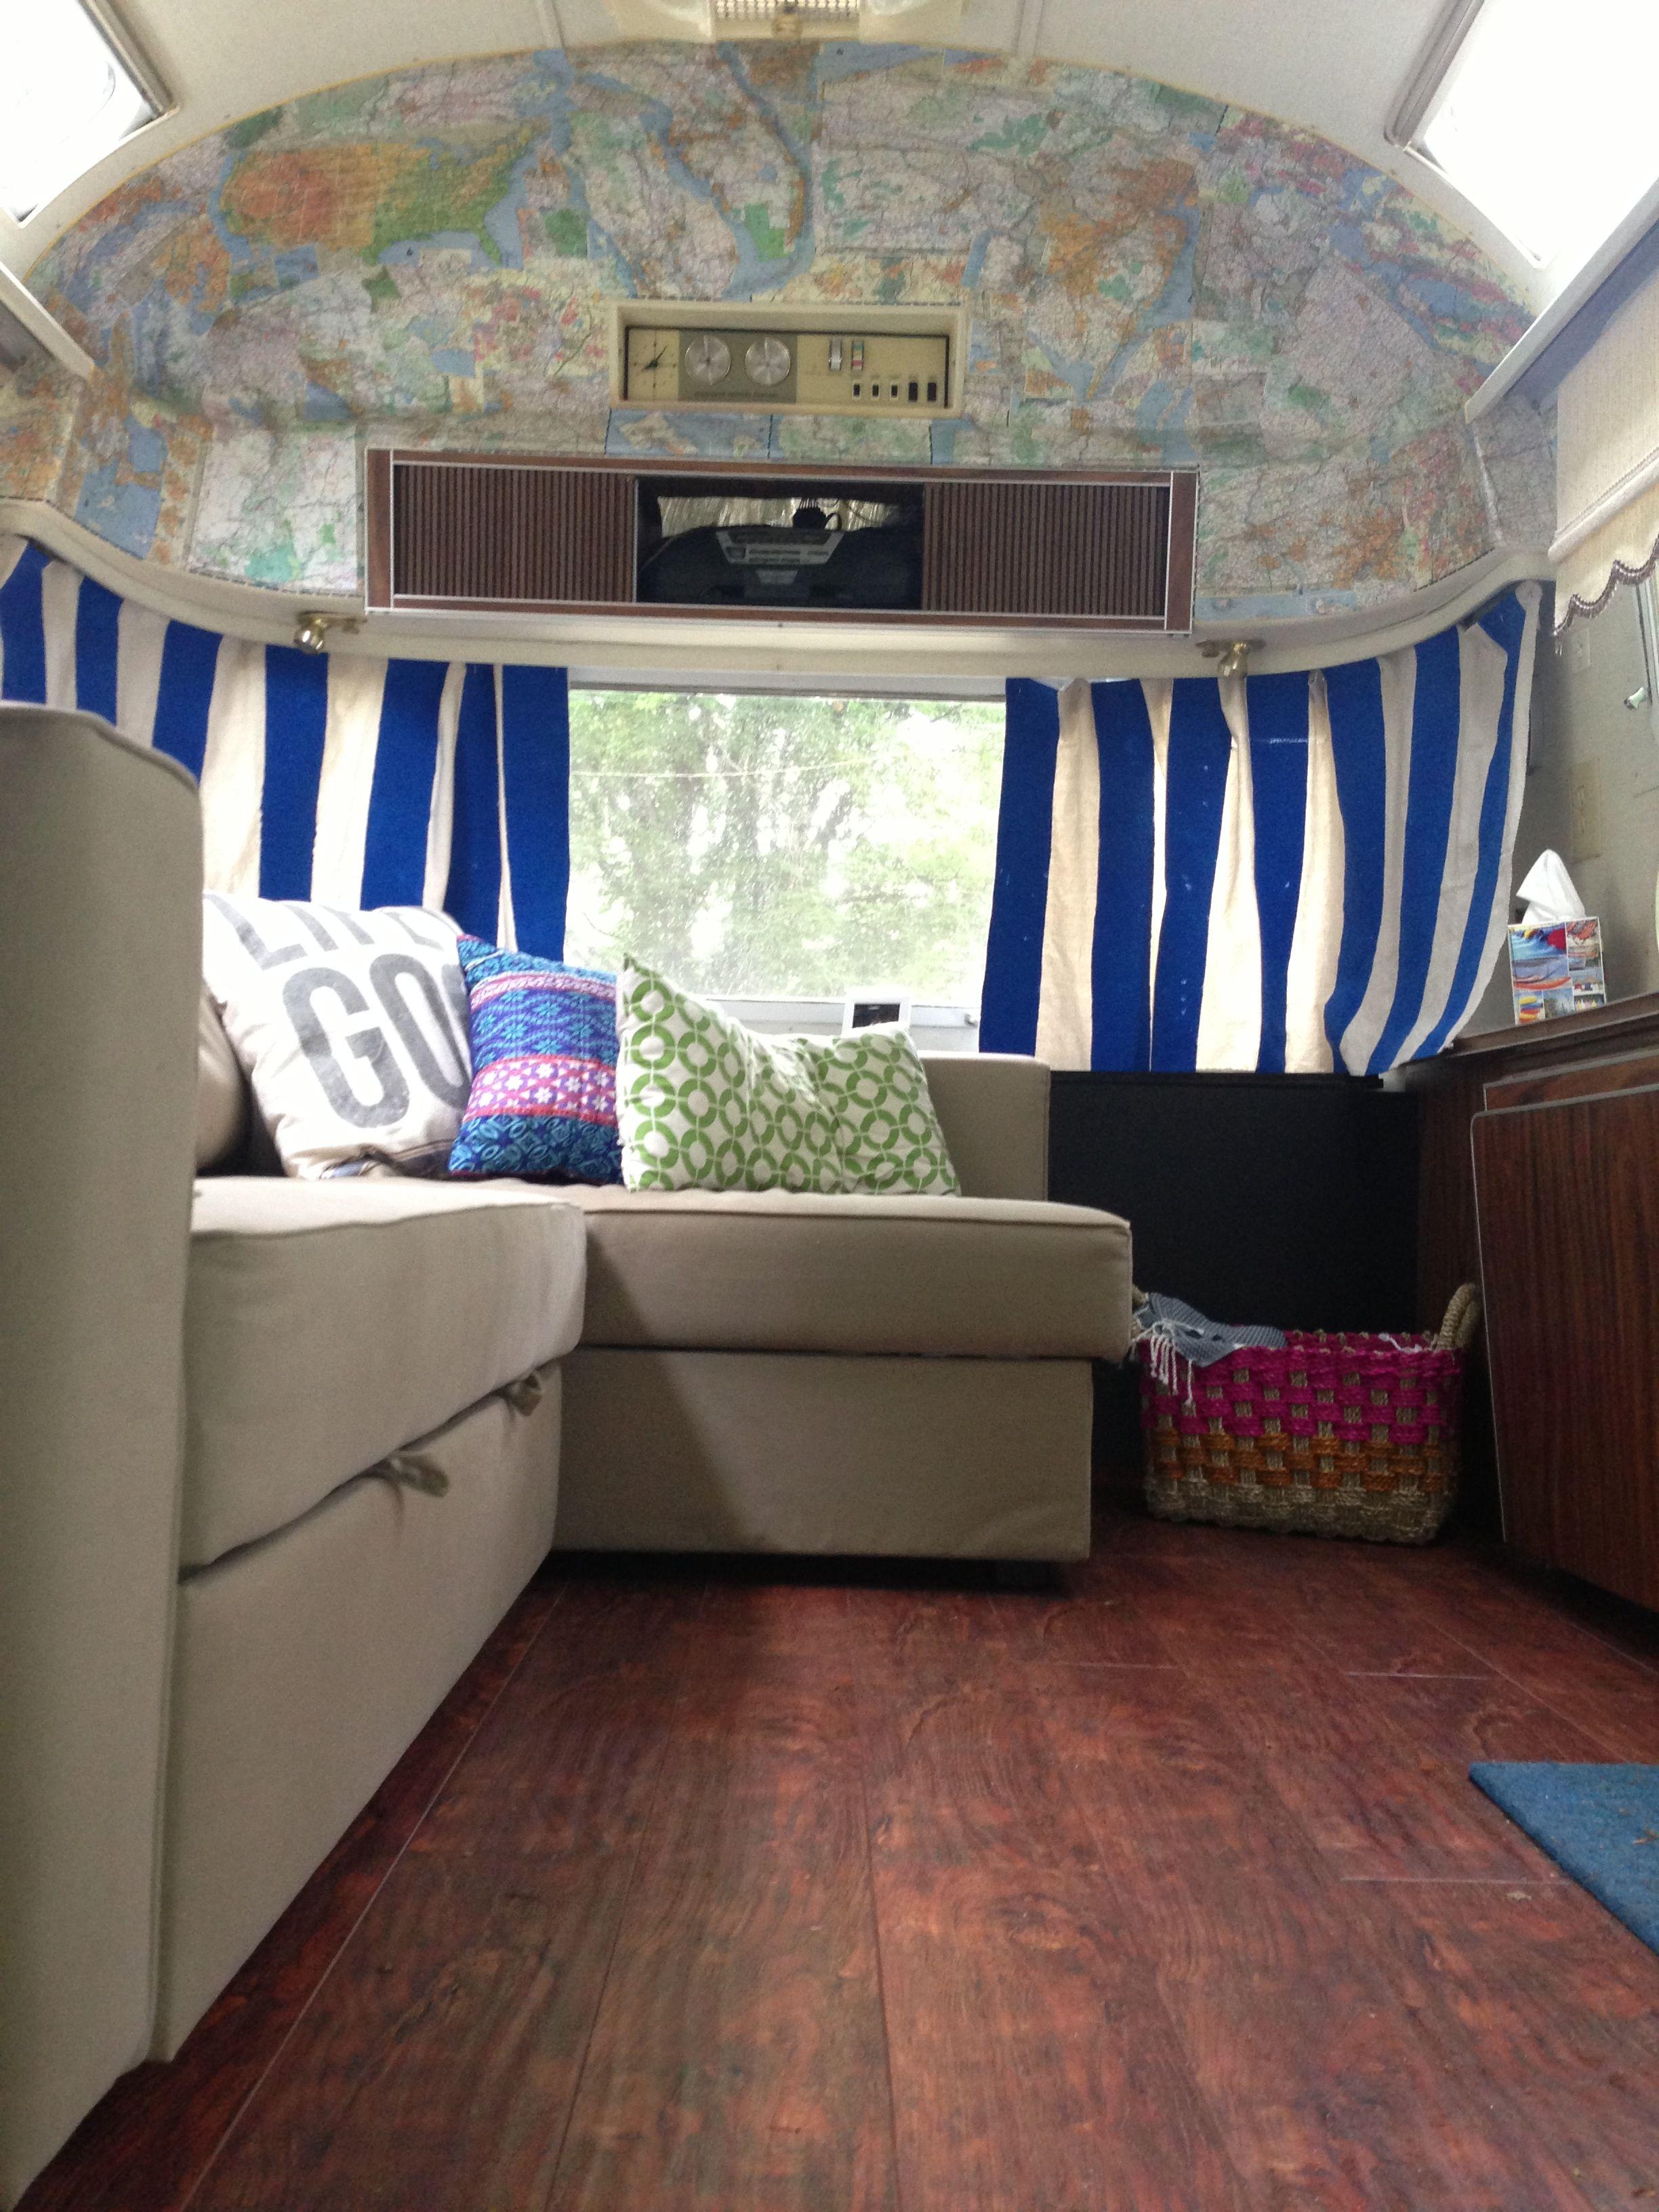 Fine Ikea Manstad Couch Vintage Map Wallpaper In This Cute Creativecarmelina Interior Chair Design Creativecarmelinacom